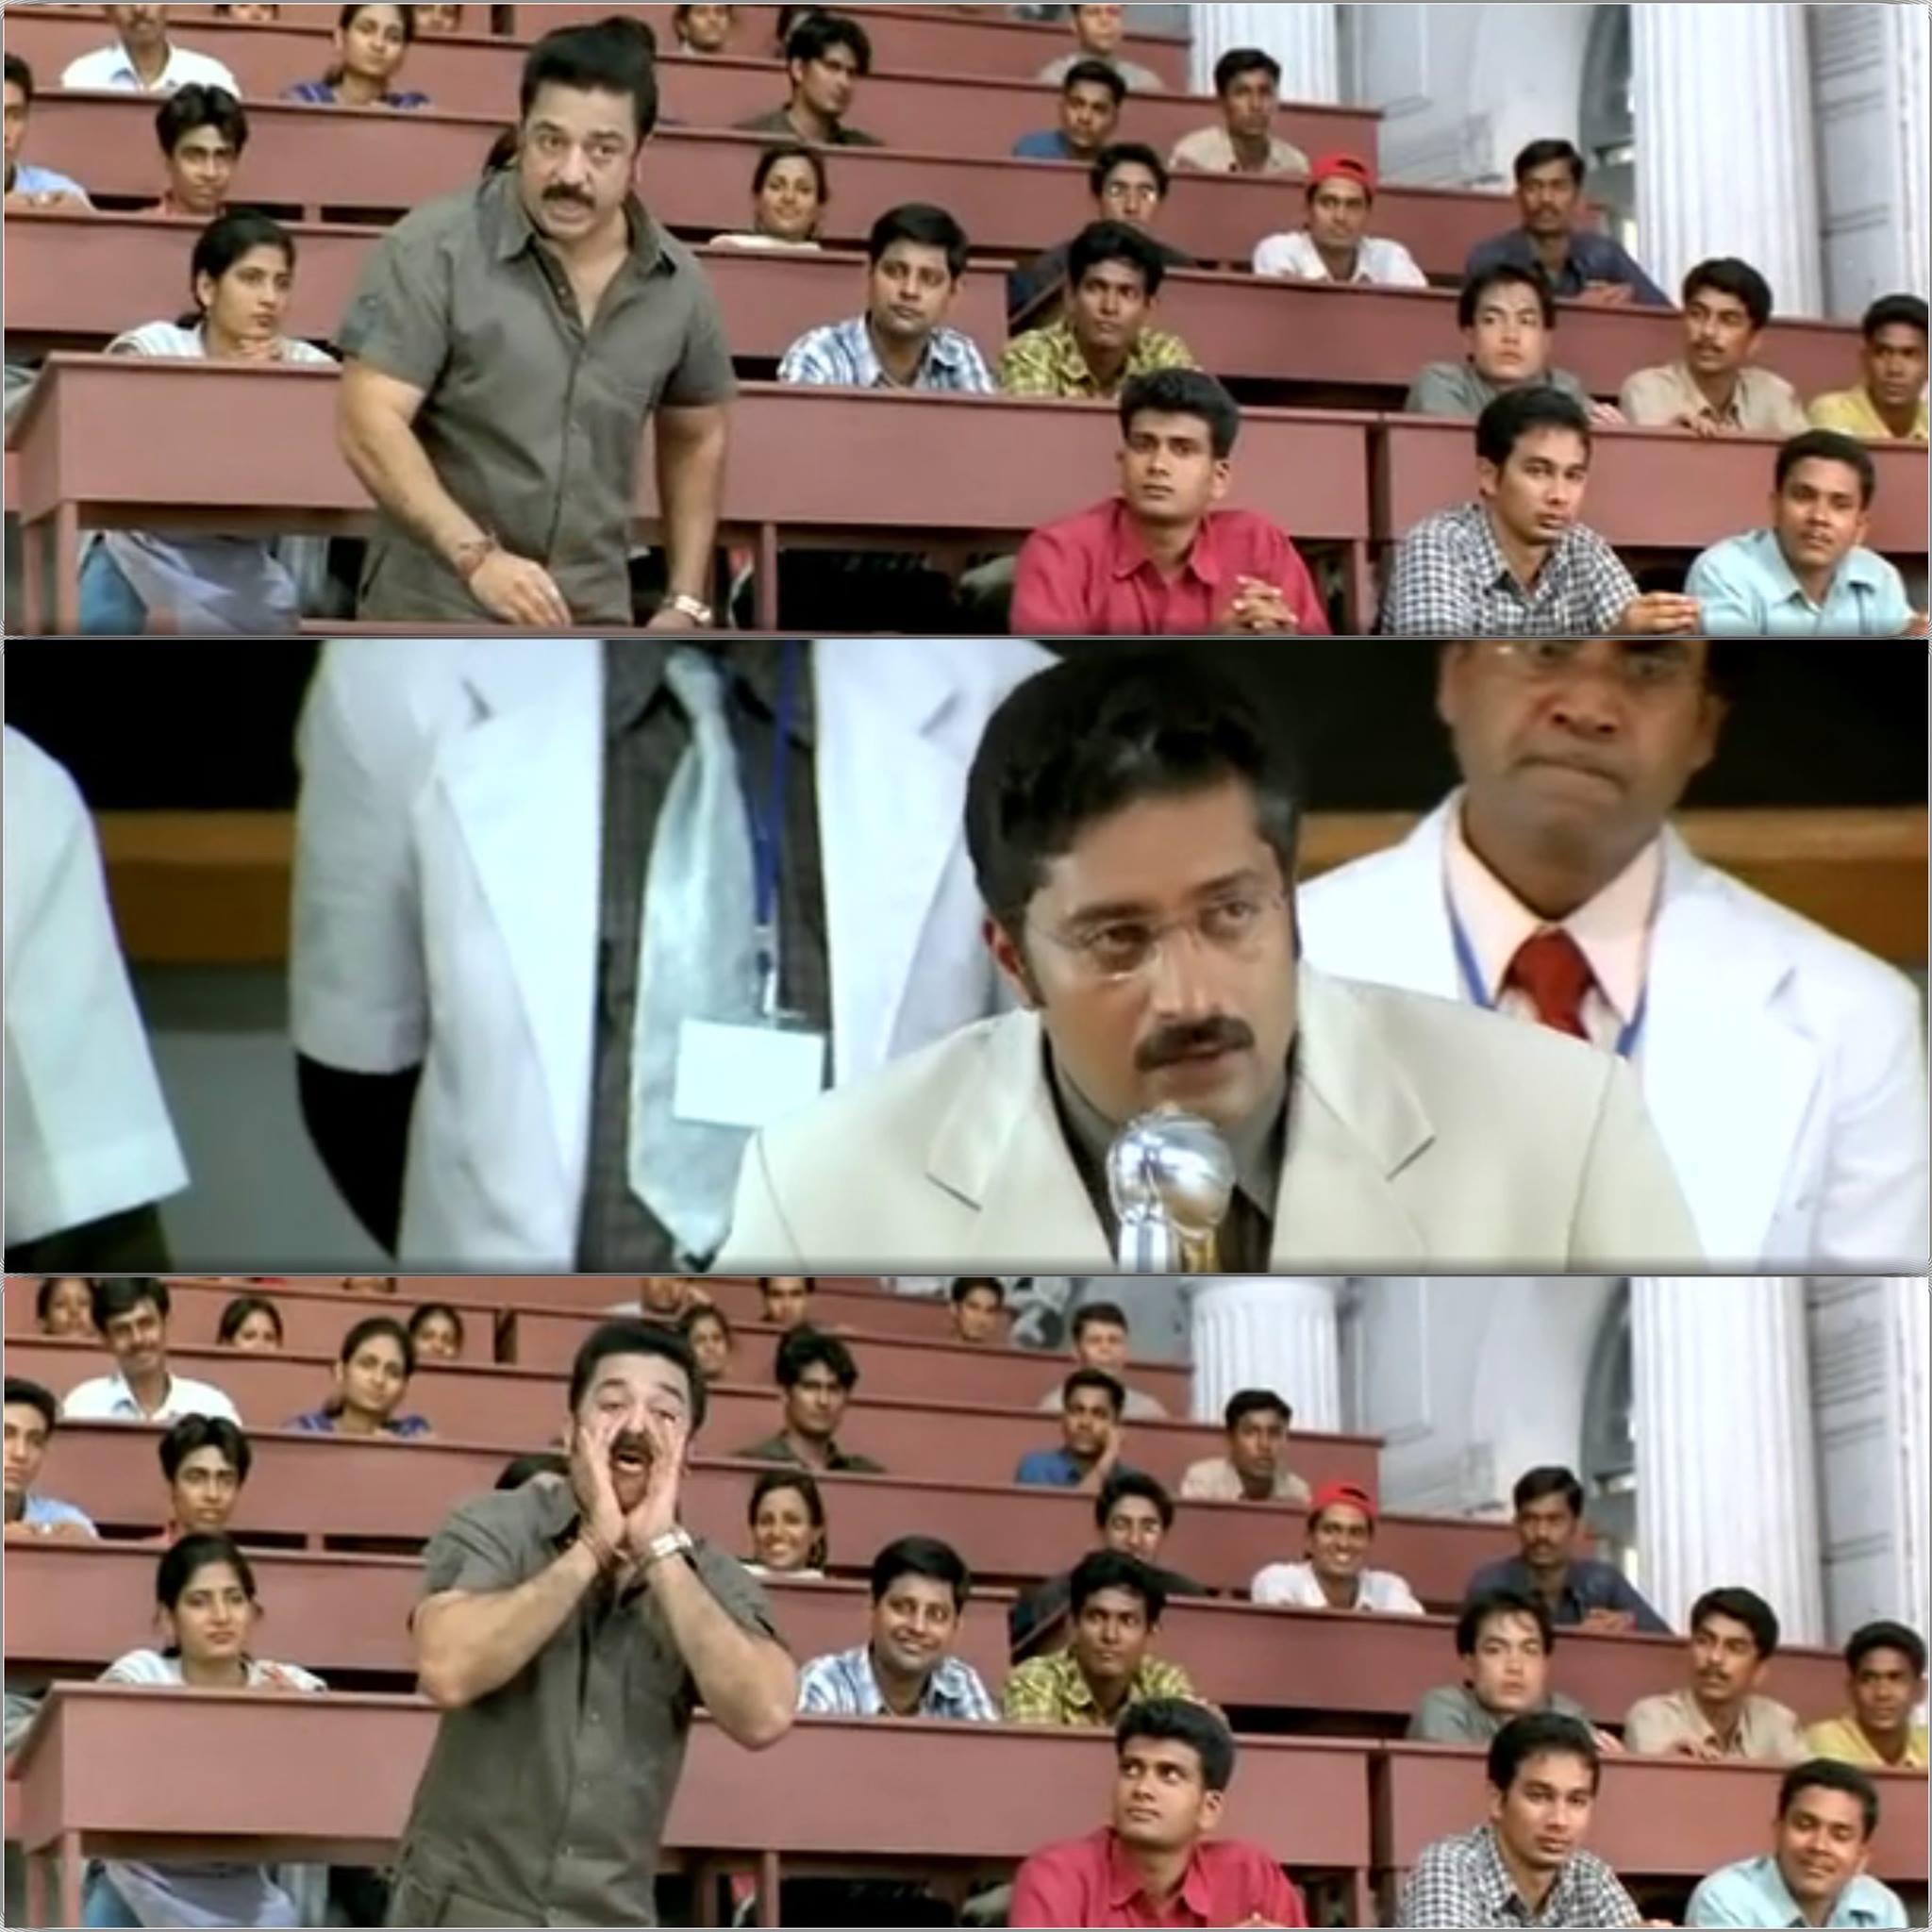 Frequently Used Tamil Meme Templates 14 Kakakapo